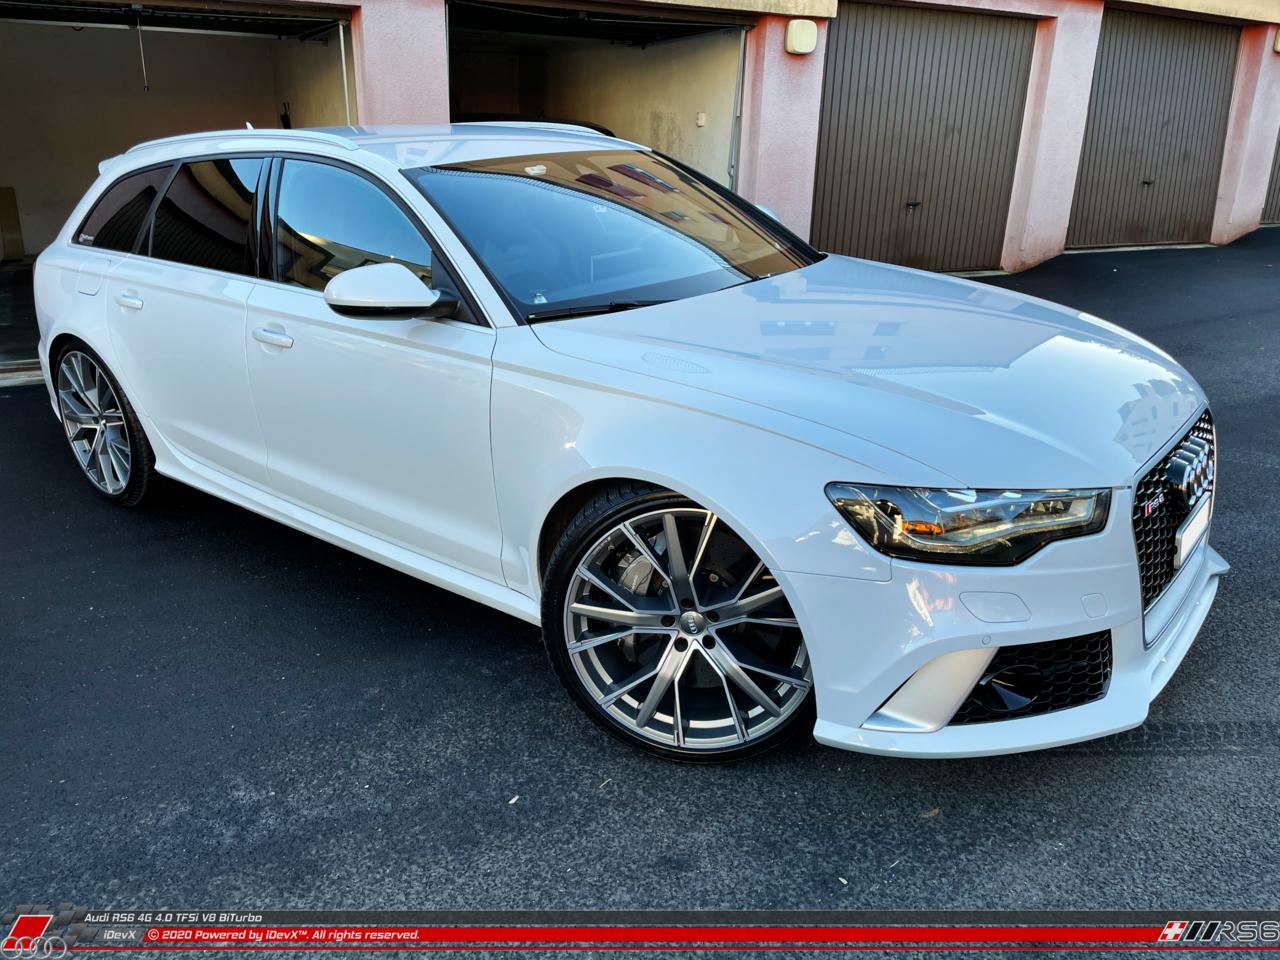 21.02.2021_Audi-RS6_iDevX_001.png